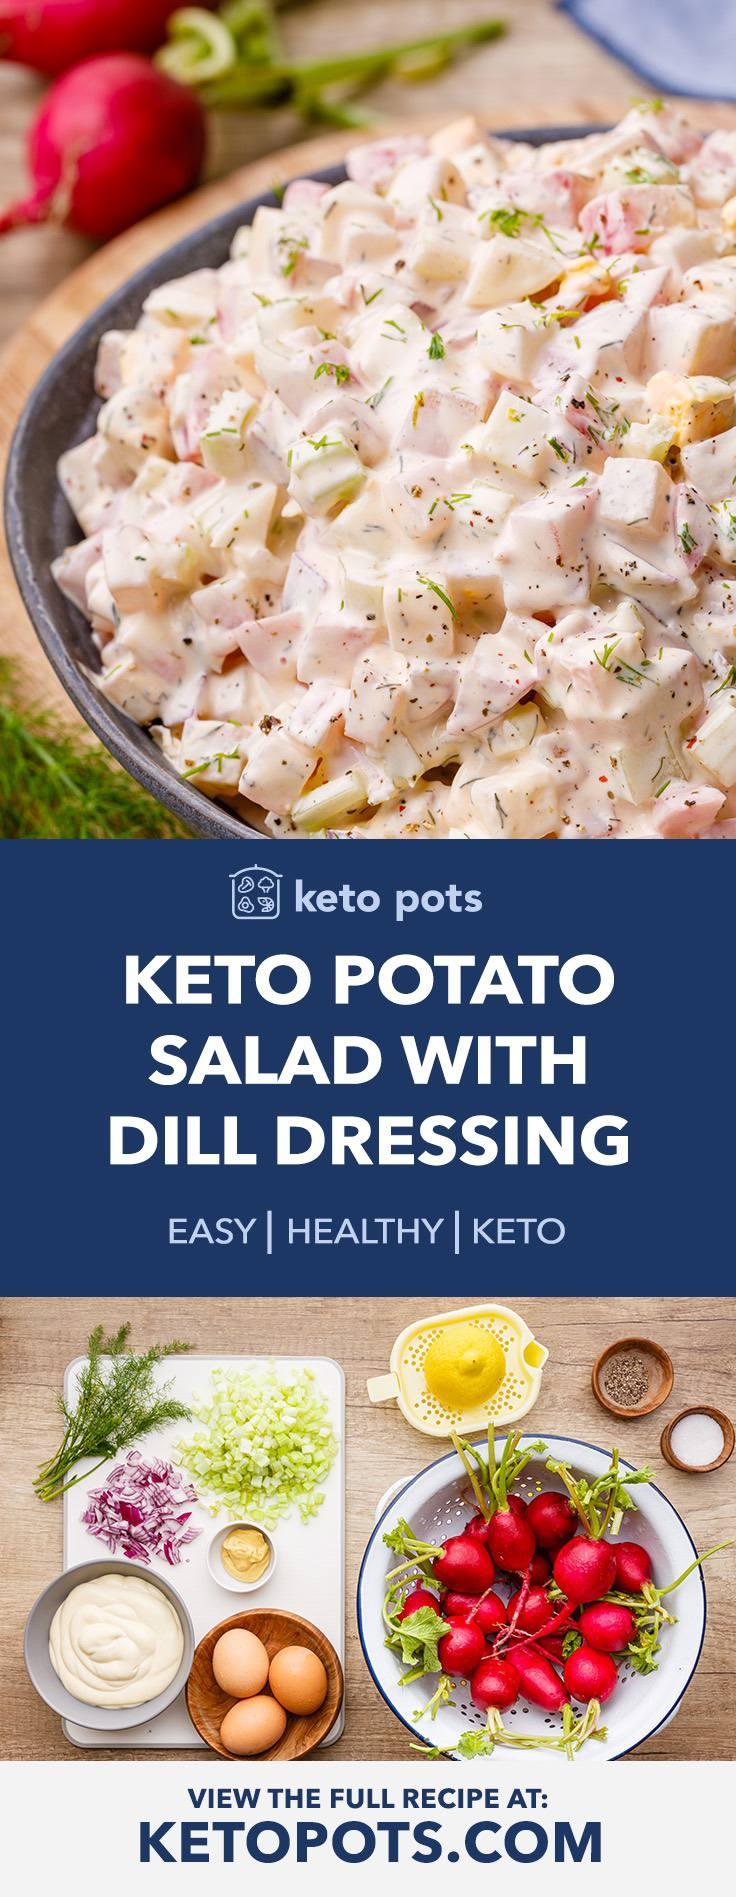 Low Carb Radish Keto Potato Salad with Creamy Dill Dressing